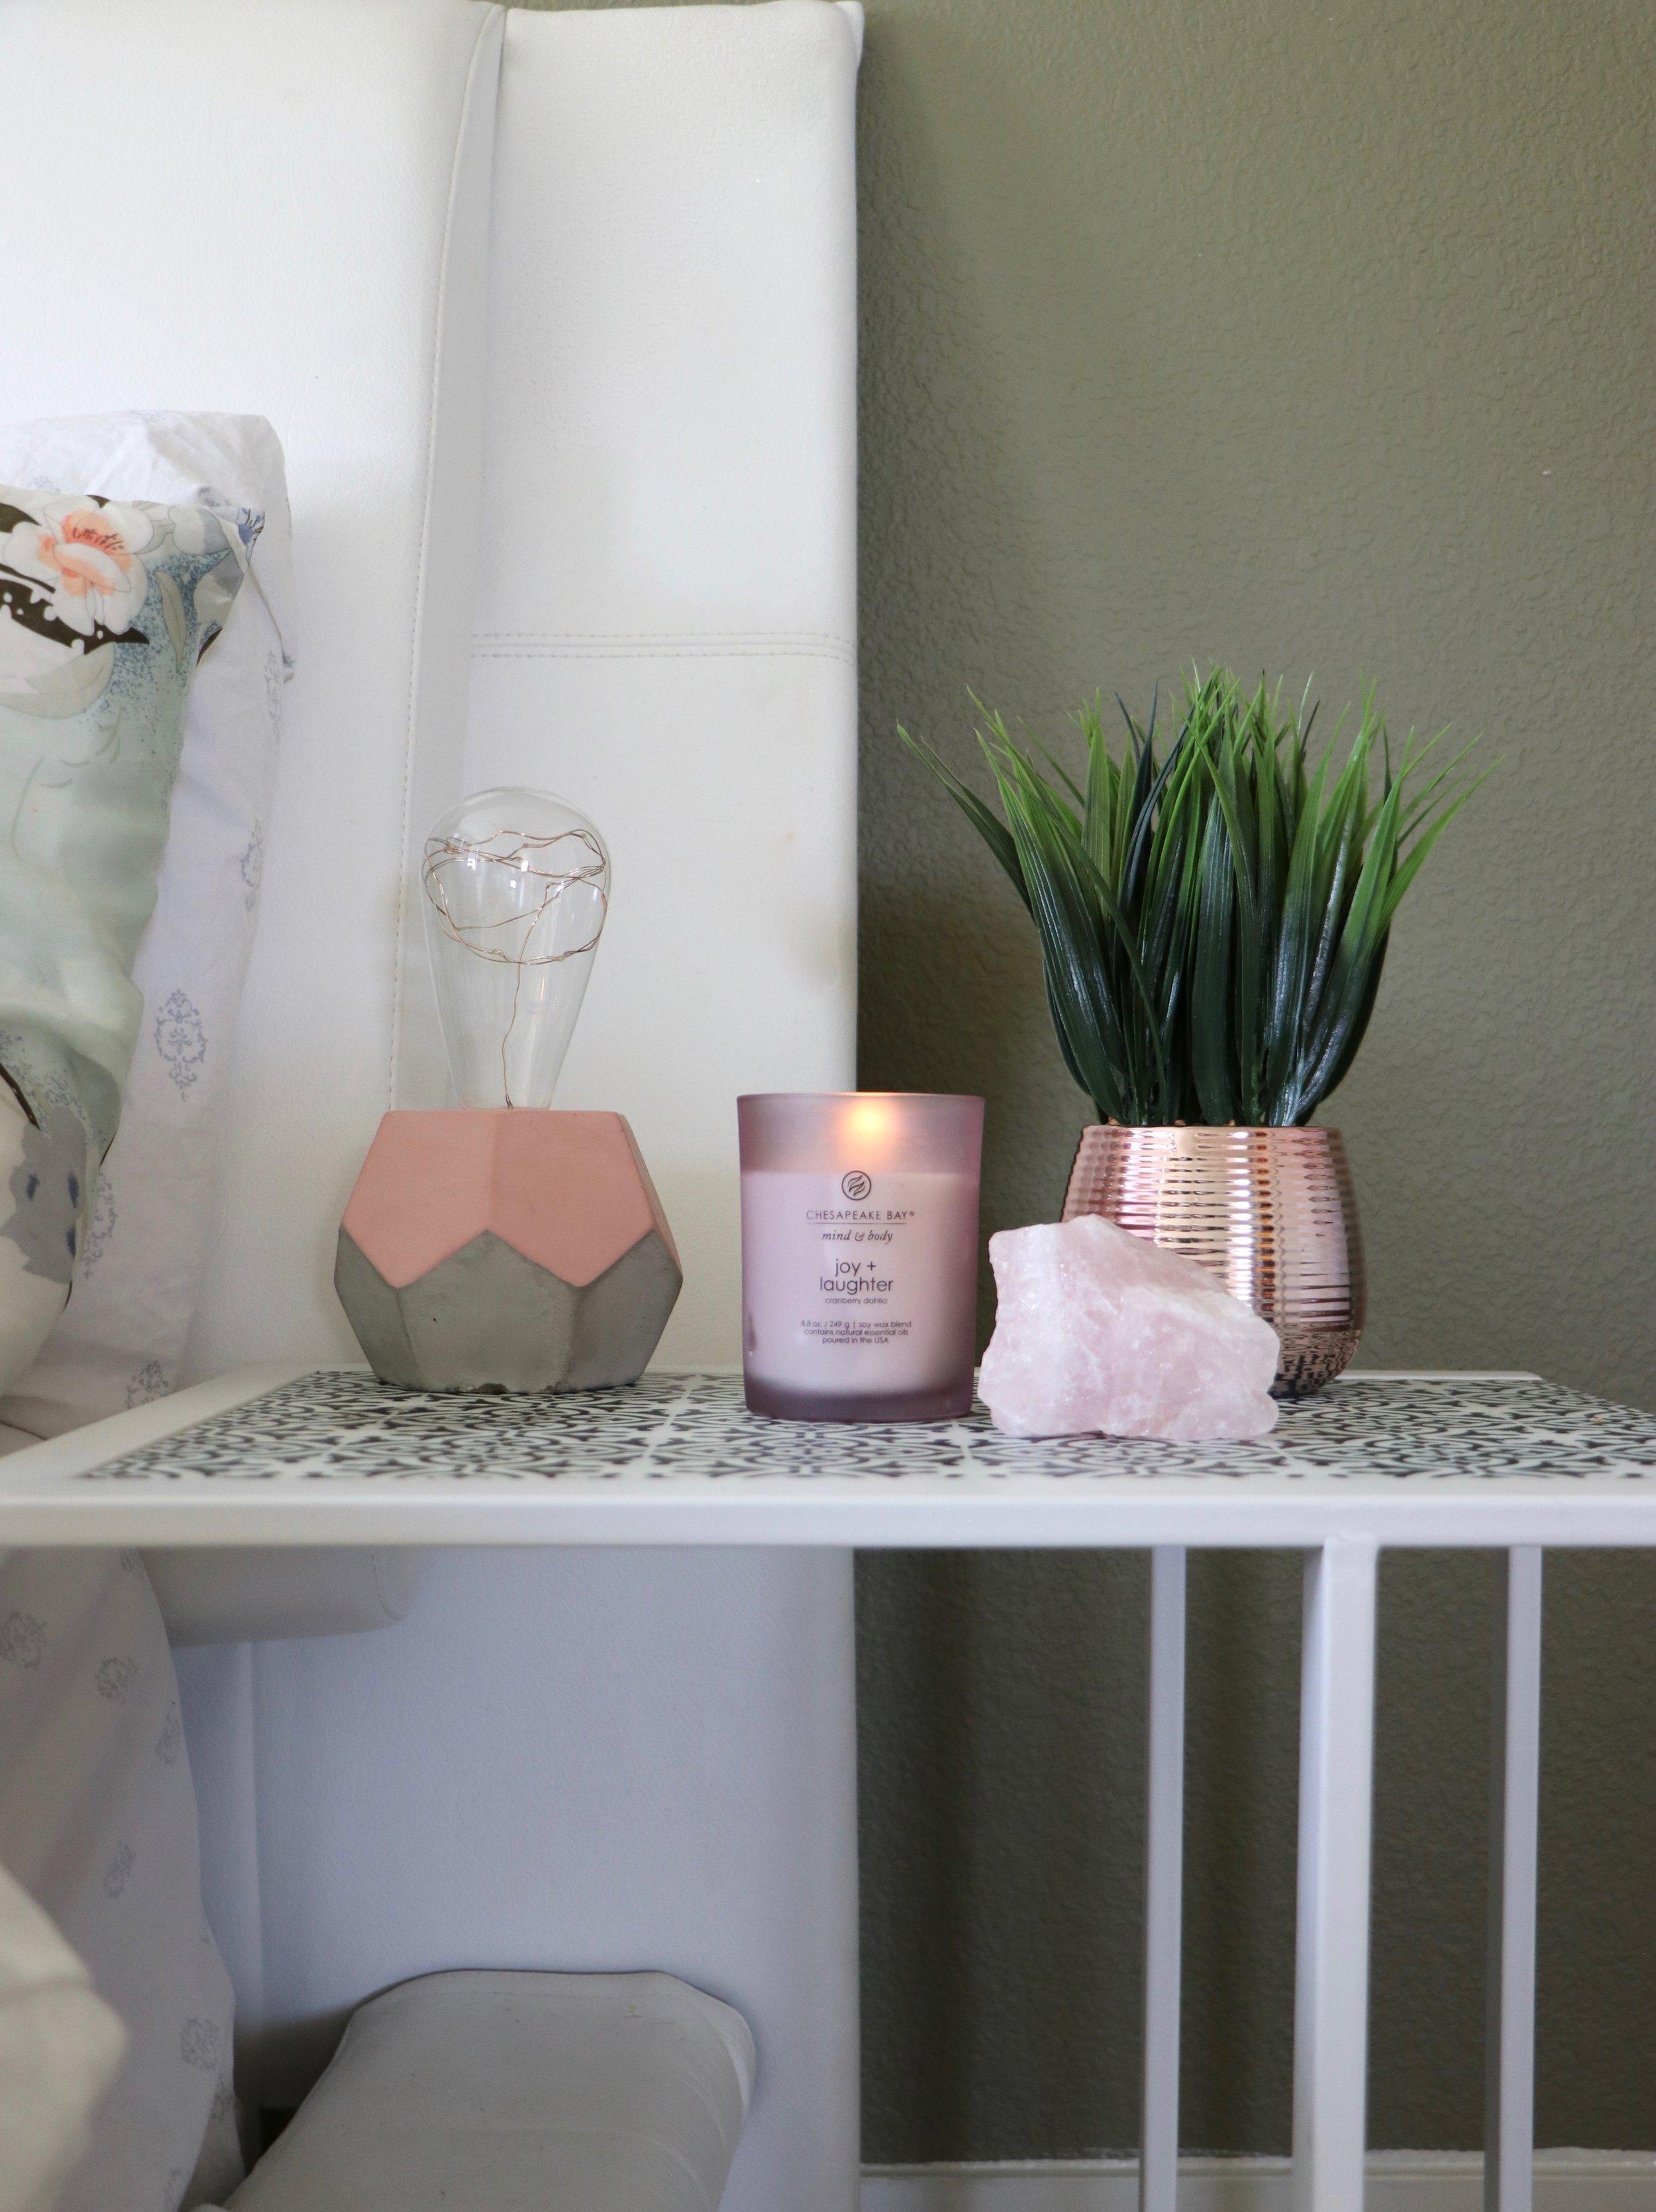 Joy + Laughter Medium Jar Candle by Chesapeake Bay